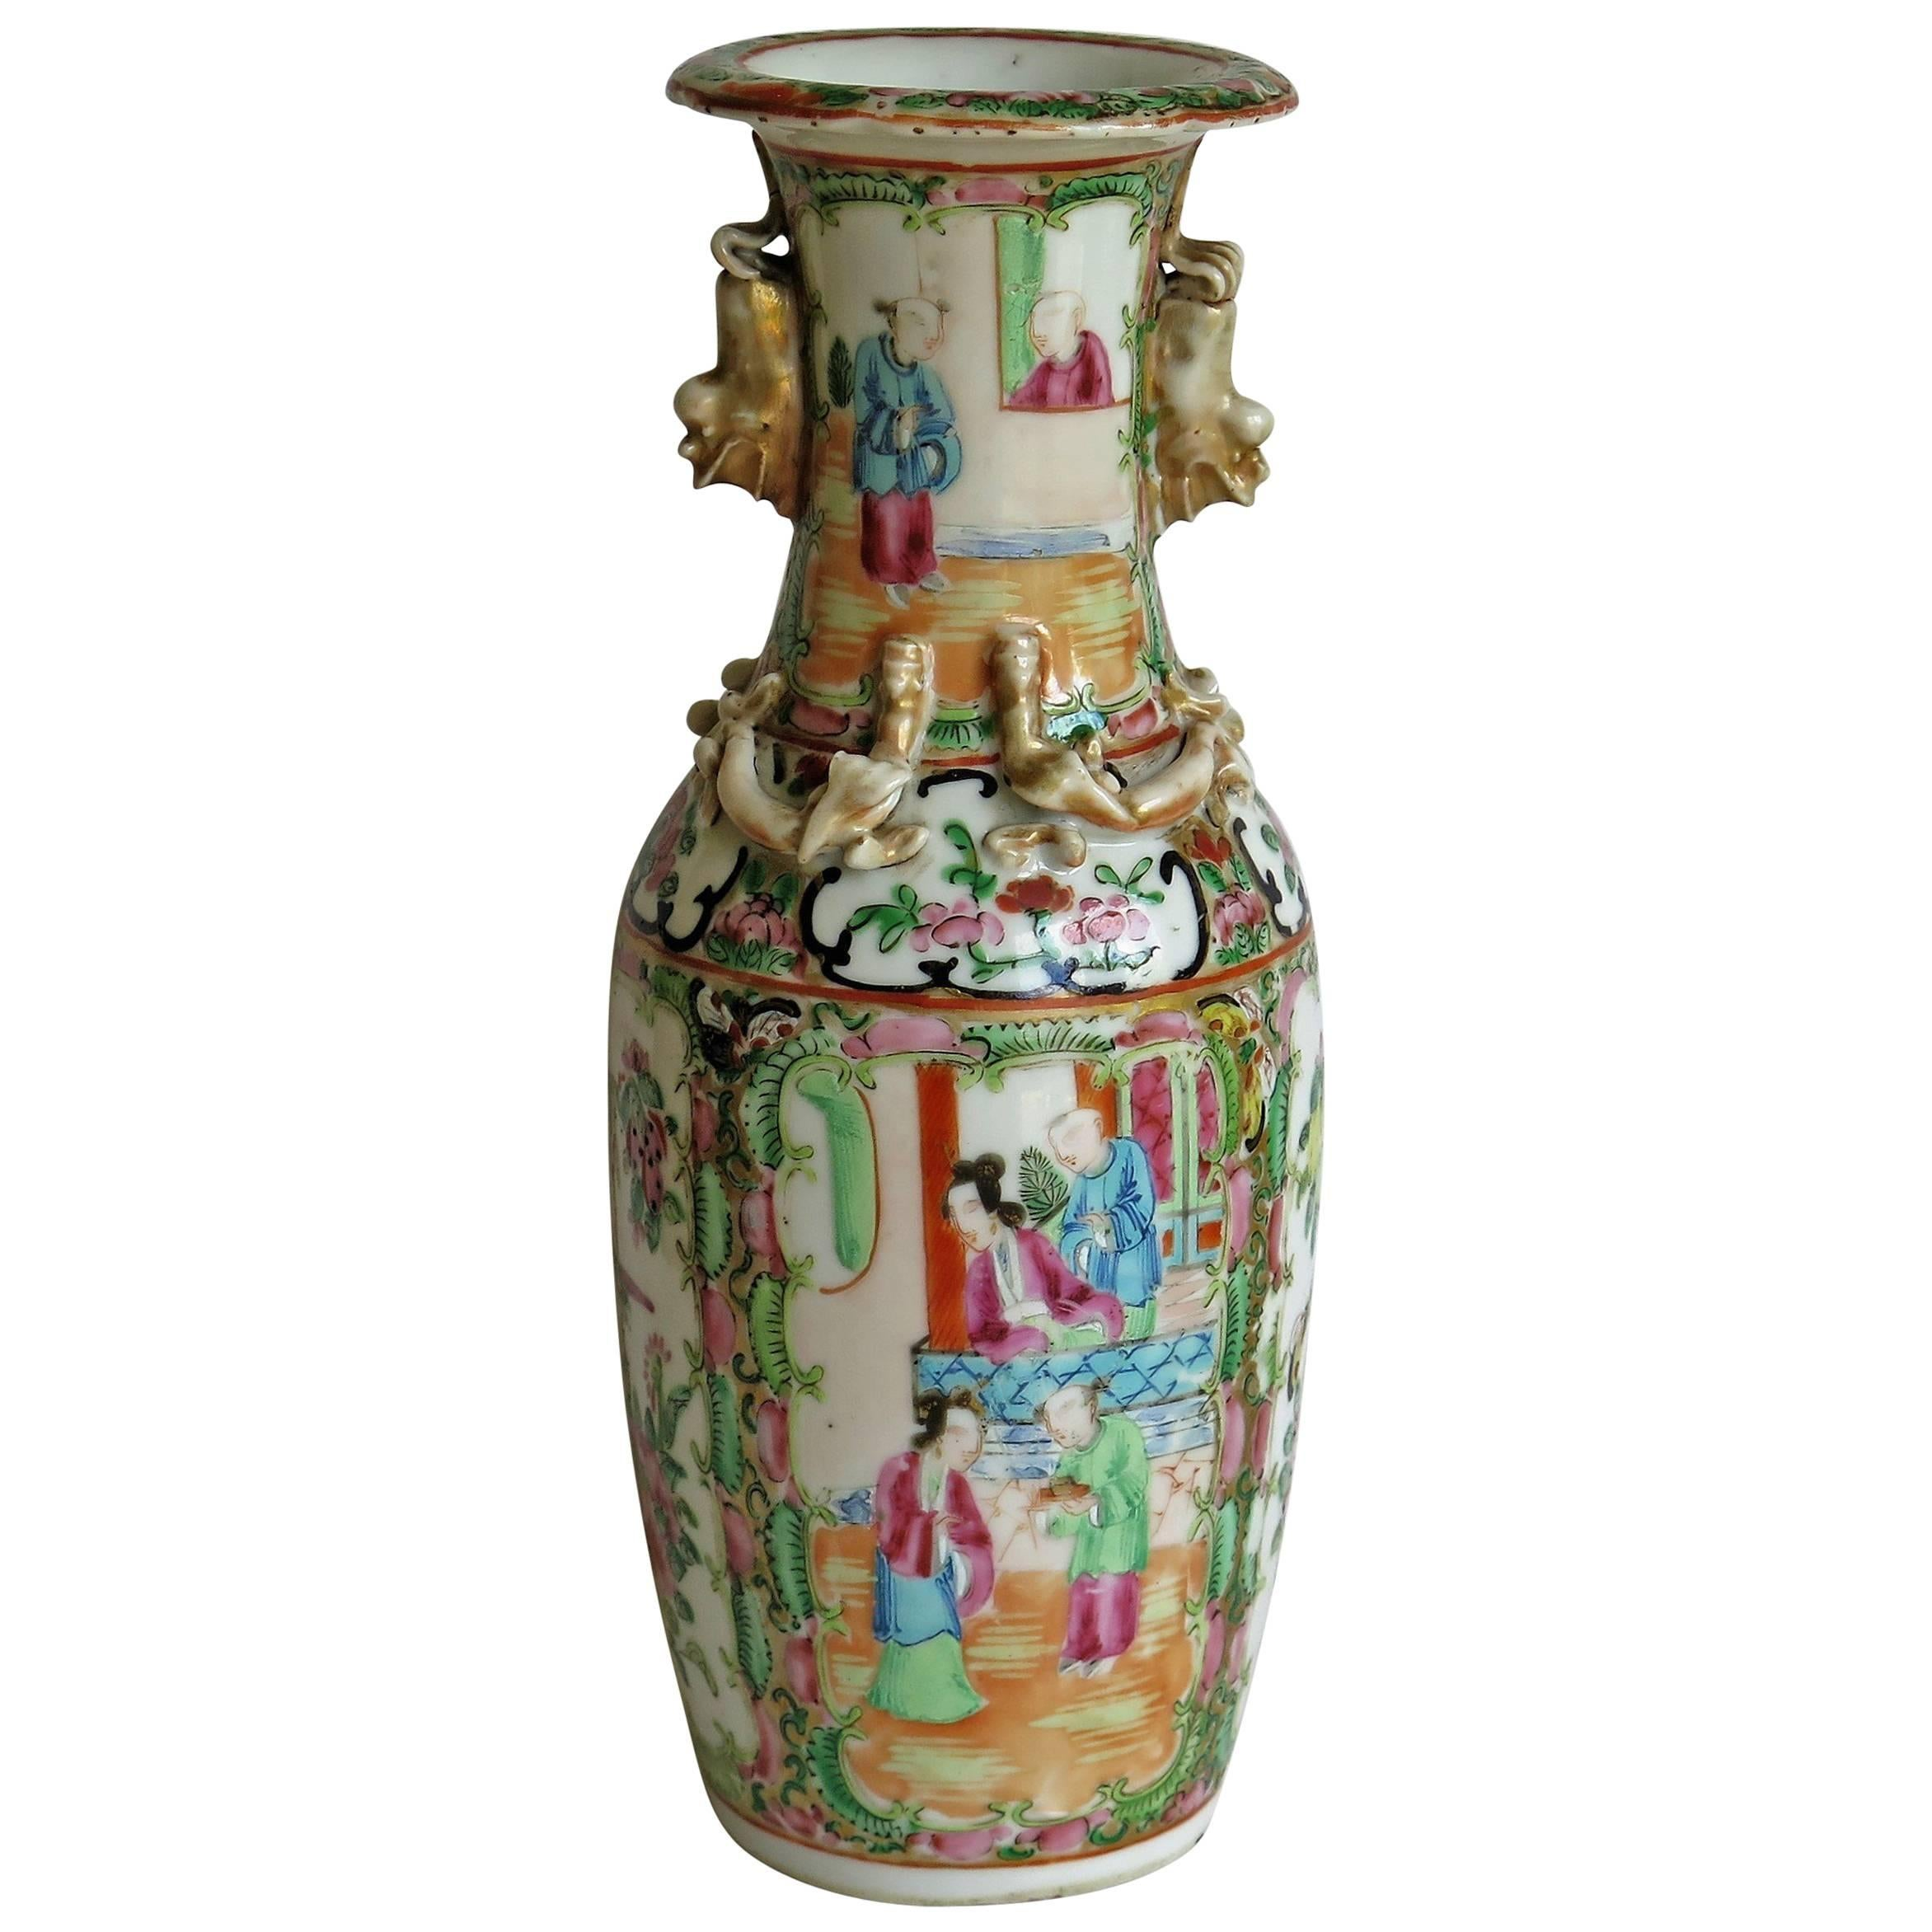 19th C. Chinese Export Rose Medallion Porcelain Vase or Lamp Base, Qing Ca. 1860